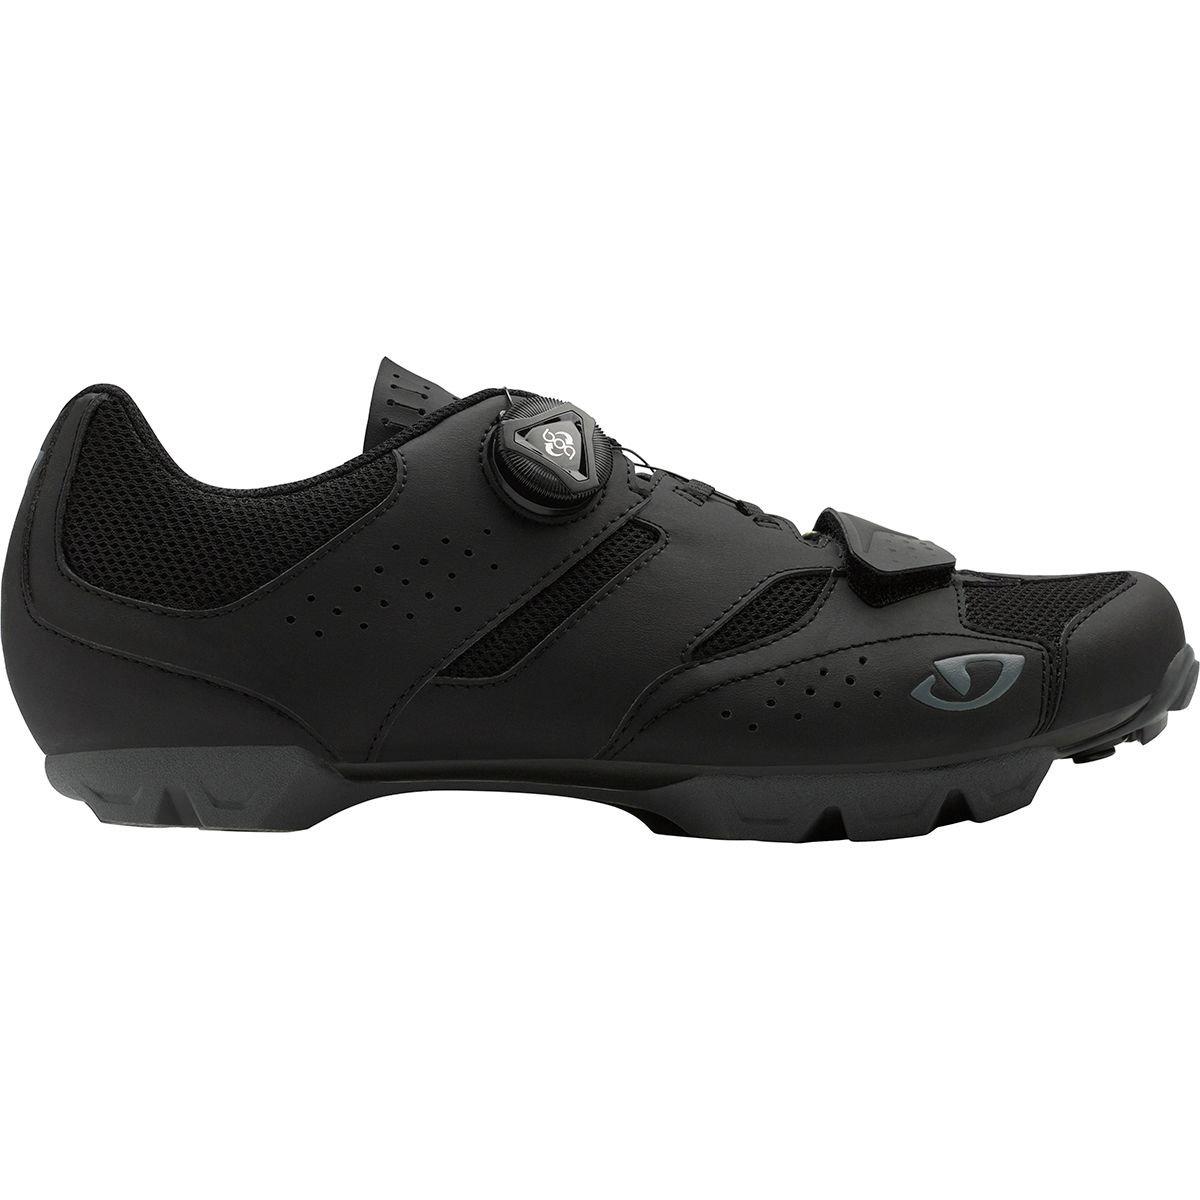 Giro円柱HV +サイクリング靴 – Men 's 43 M EU ブラック   B075RP8JKT